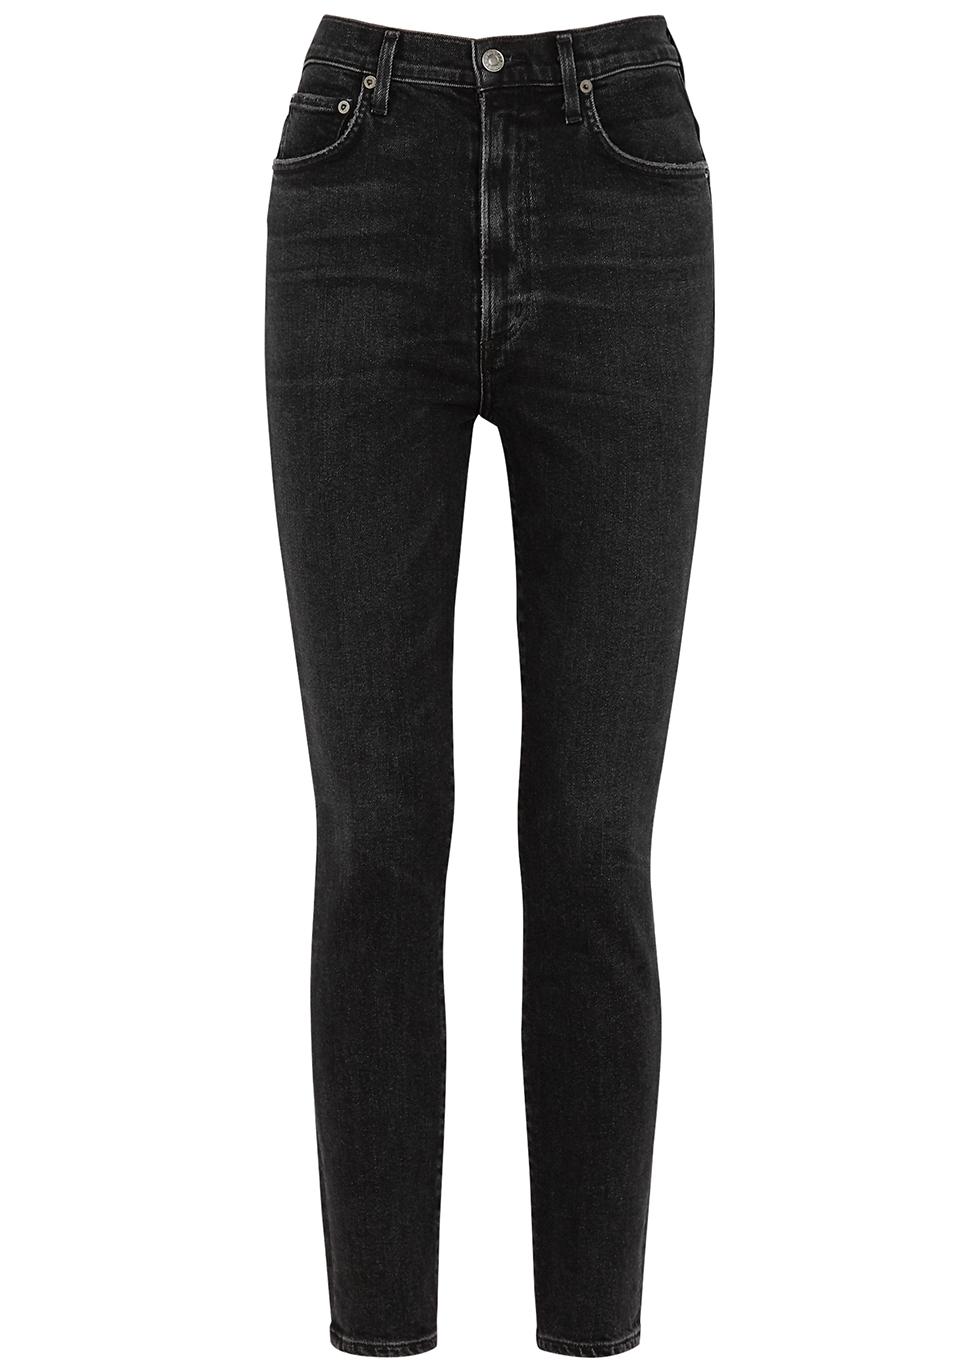 Pinch Waist black skinny jeans